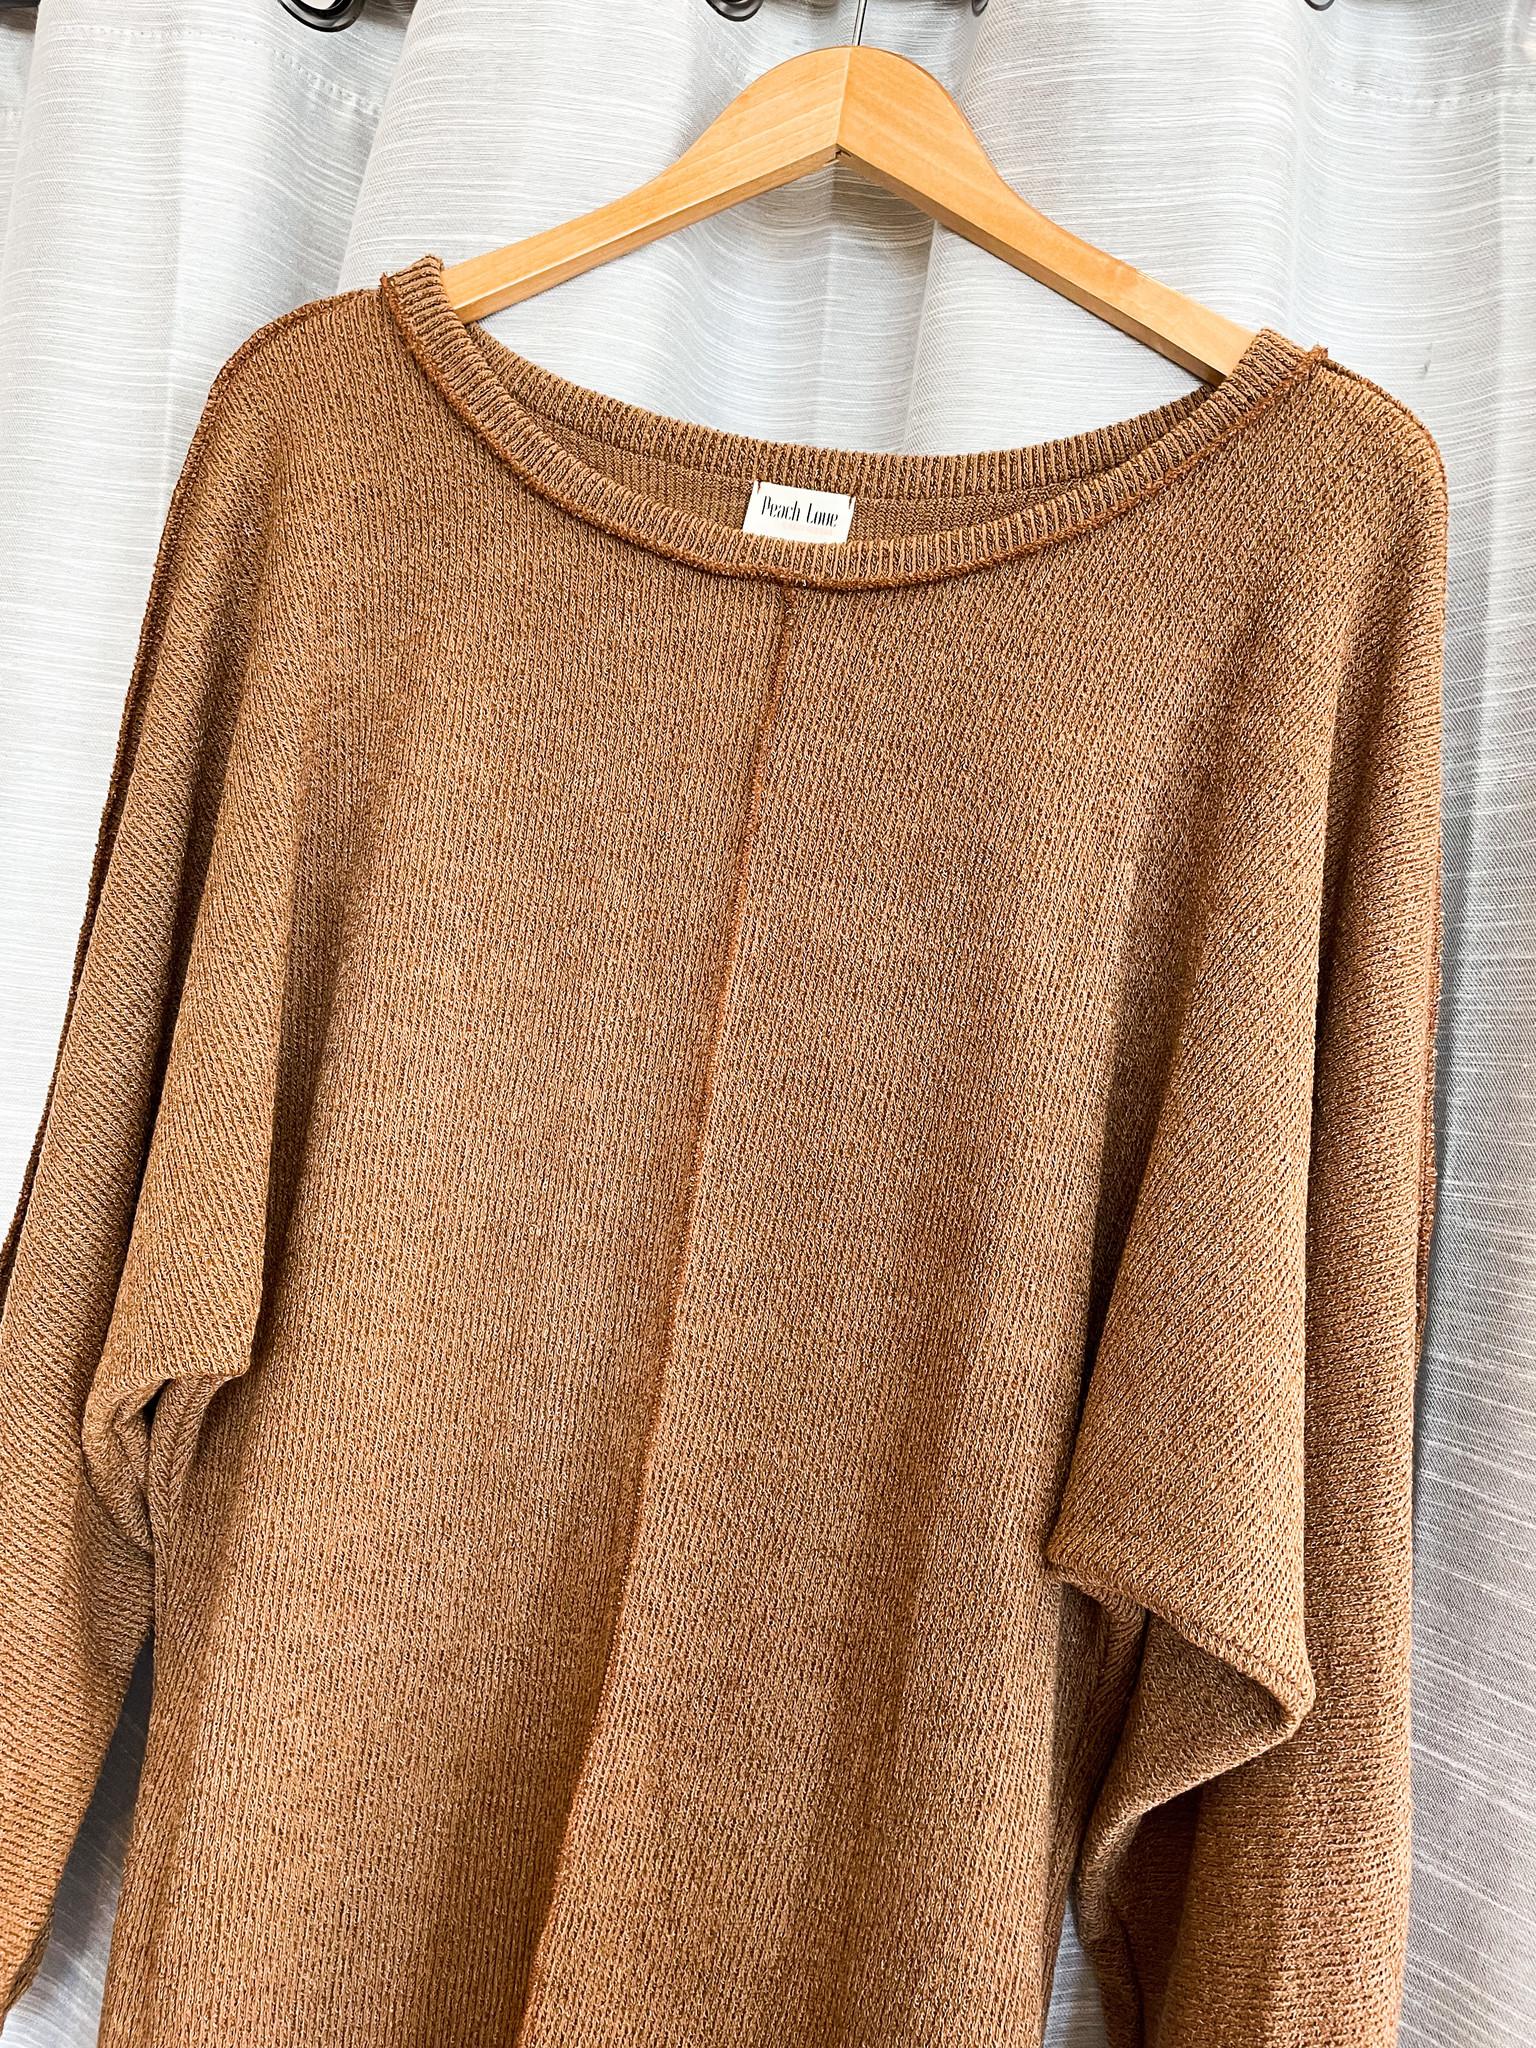 Long Sleeve Mocha Sweater Dress w/ Contrast Stitching